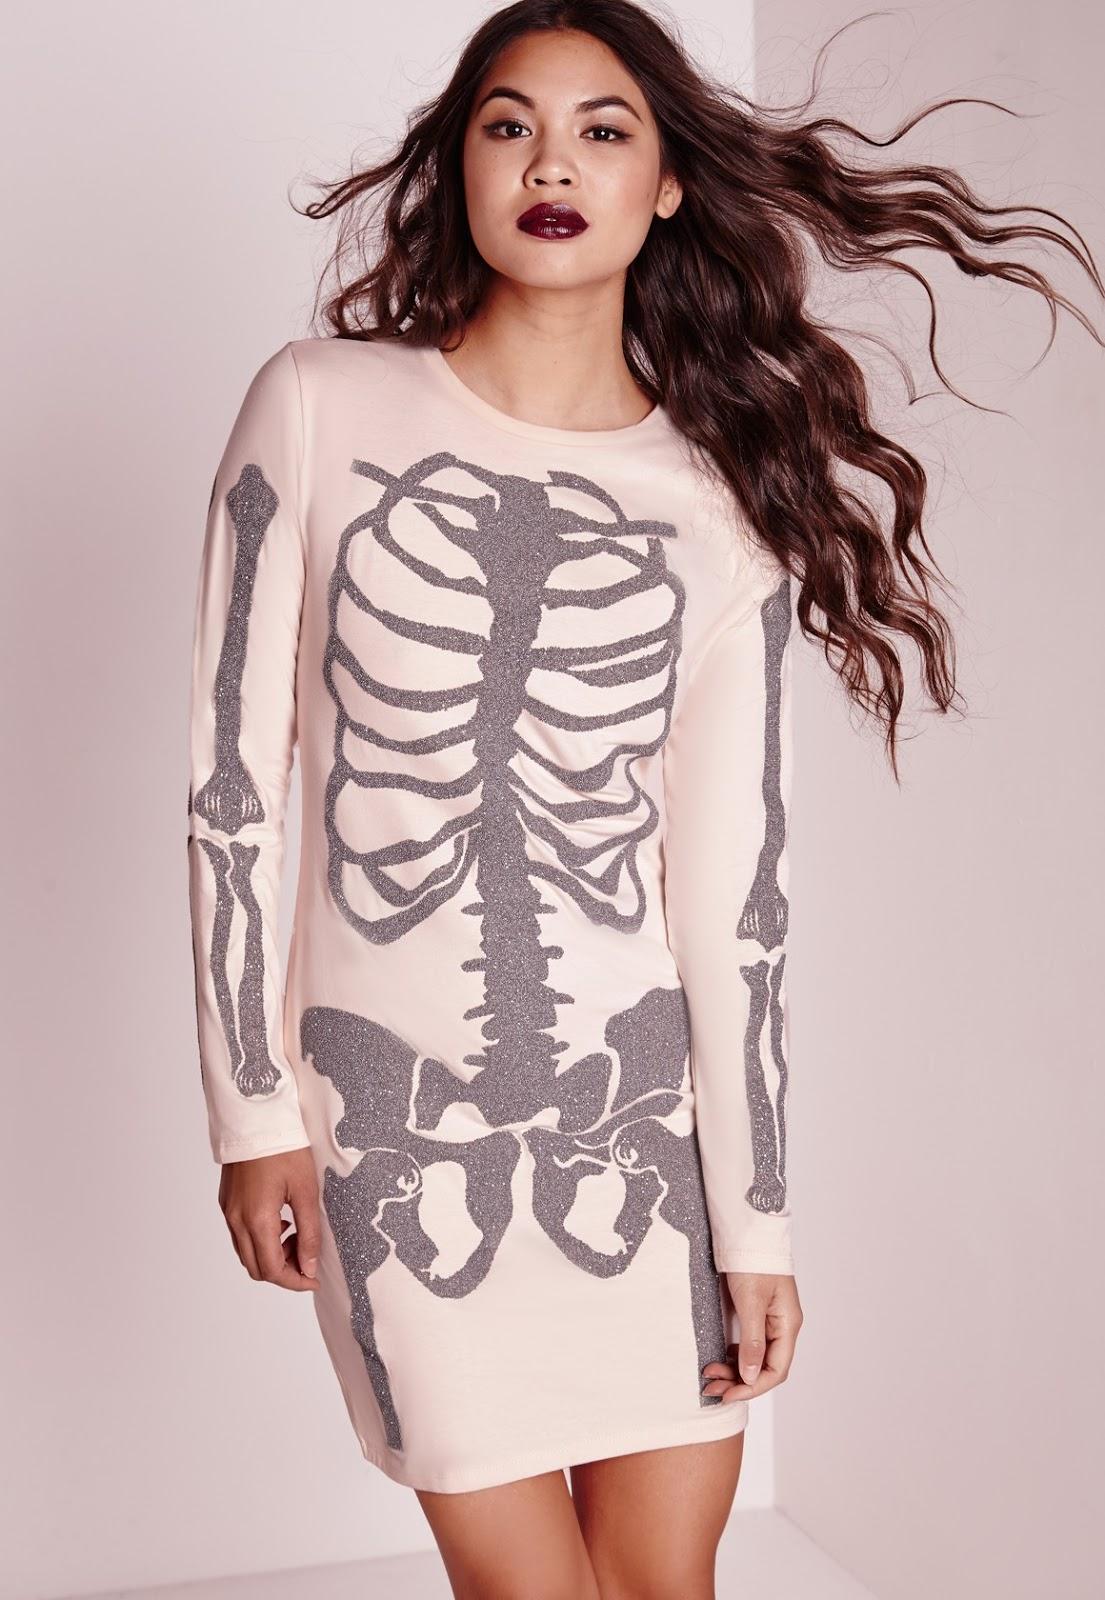 Dead Easy Halloween Costume Ideas For REALLY Busy Moms - via BirdsParty.com